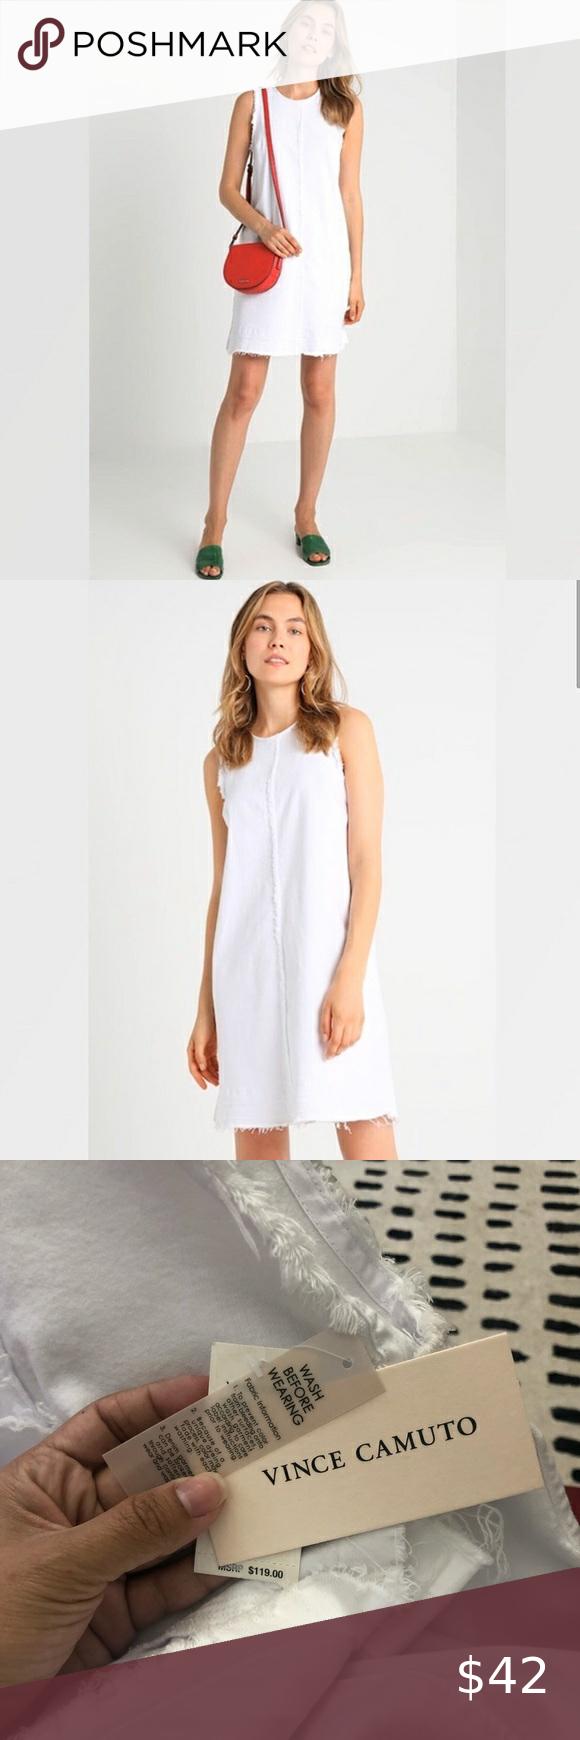 Vince Camuto Frayed White Denim Dress White Denim Dress Denim Dress White Denim [ 1740 x 580 Pixel ]